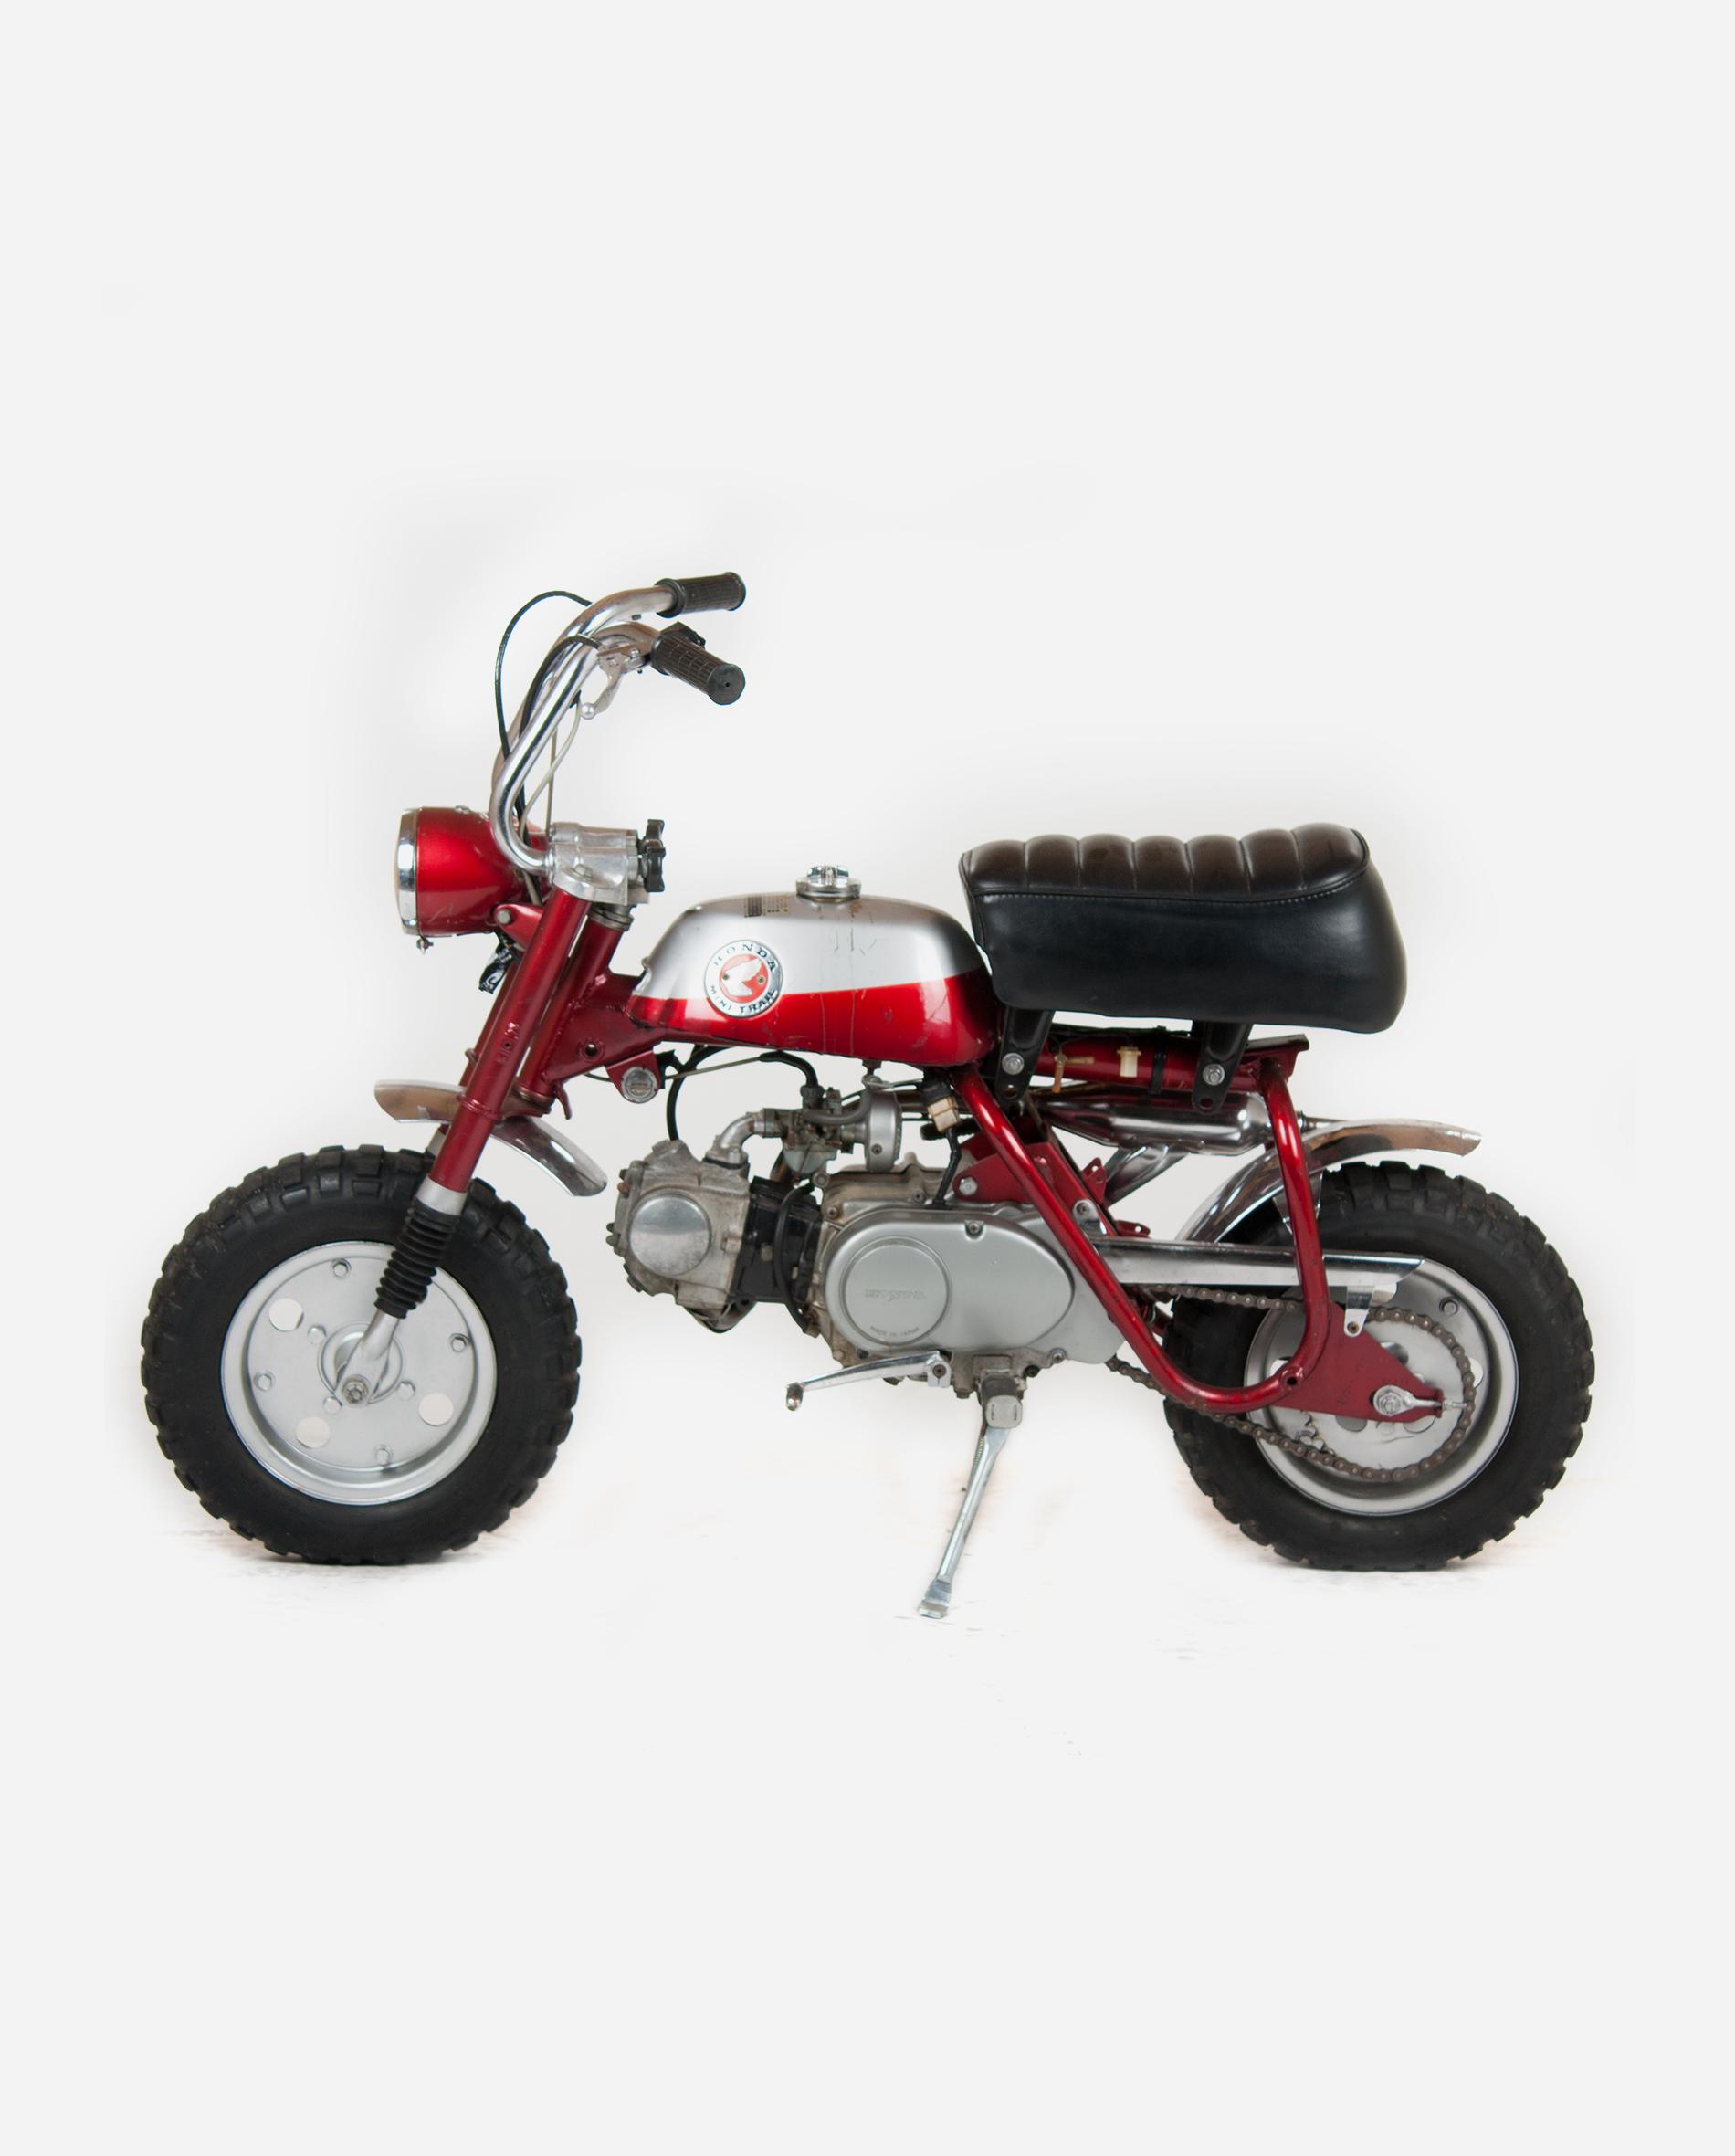 Honda-monkey-z50a-silver-l · Fourstrokebarn